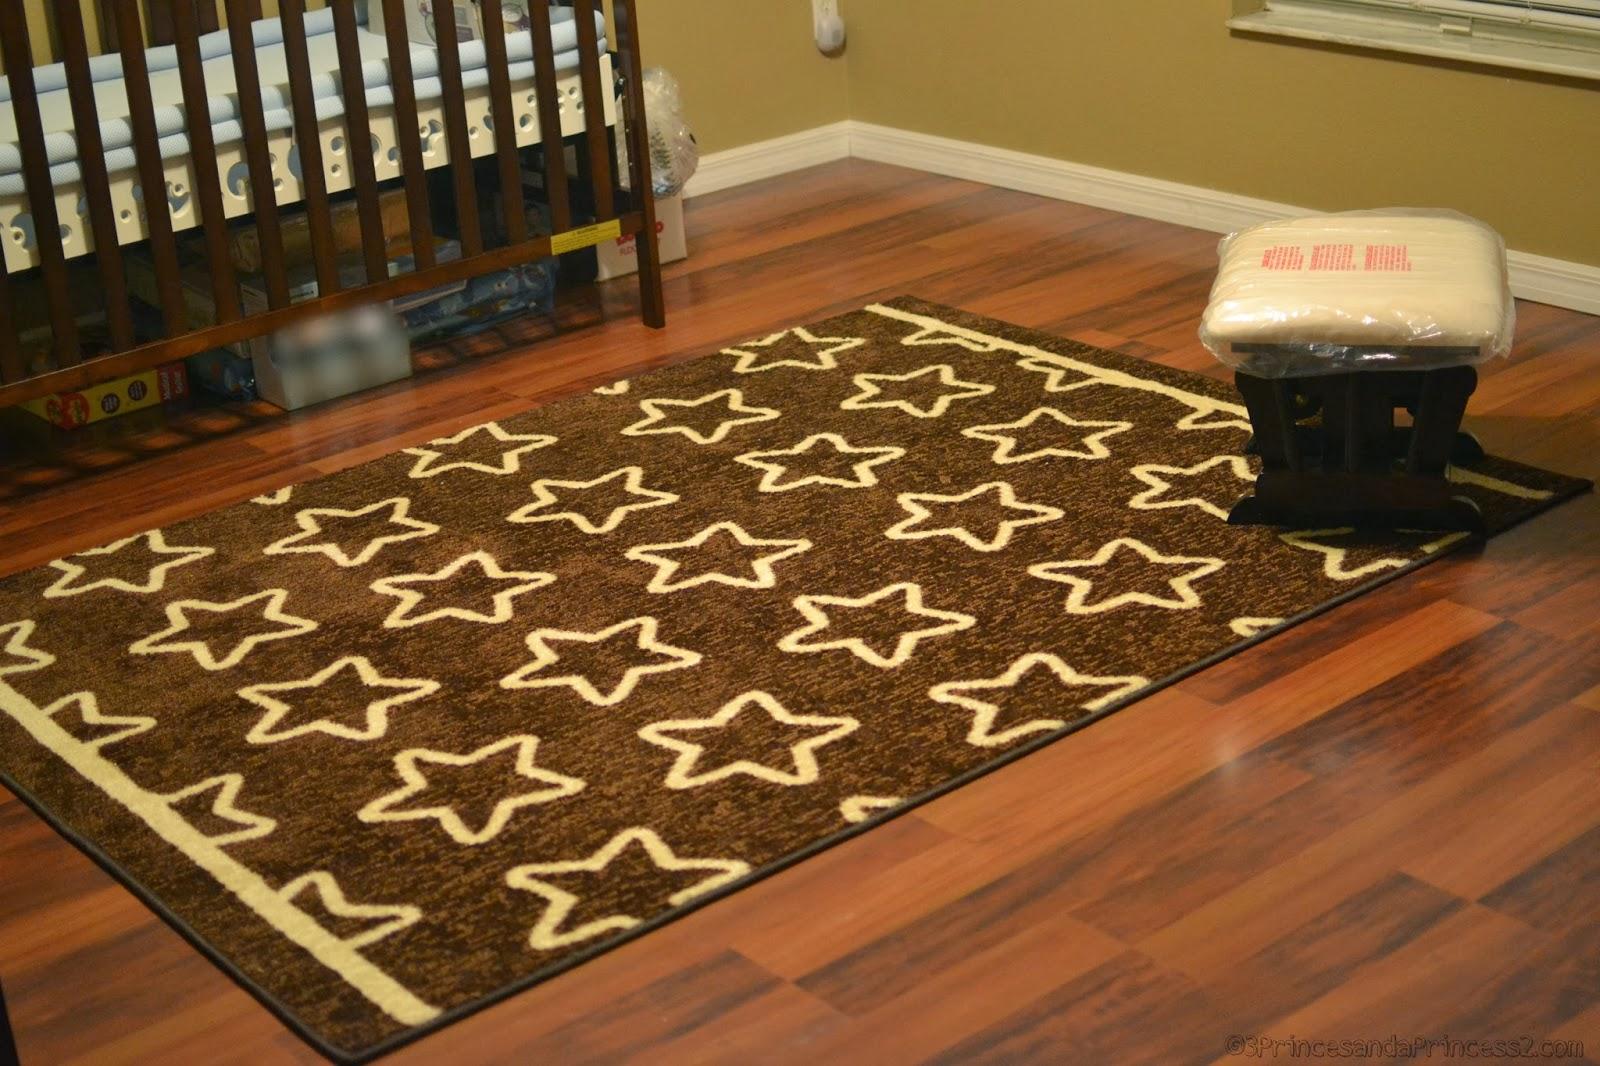 Mohawk Home Area Rug #giveaway #ilovemymohawkrug